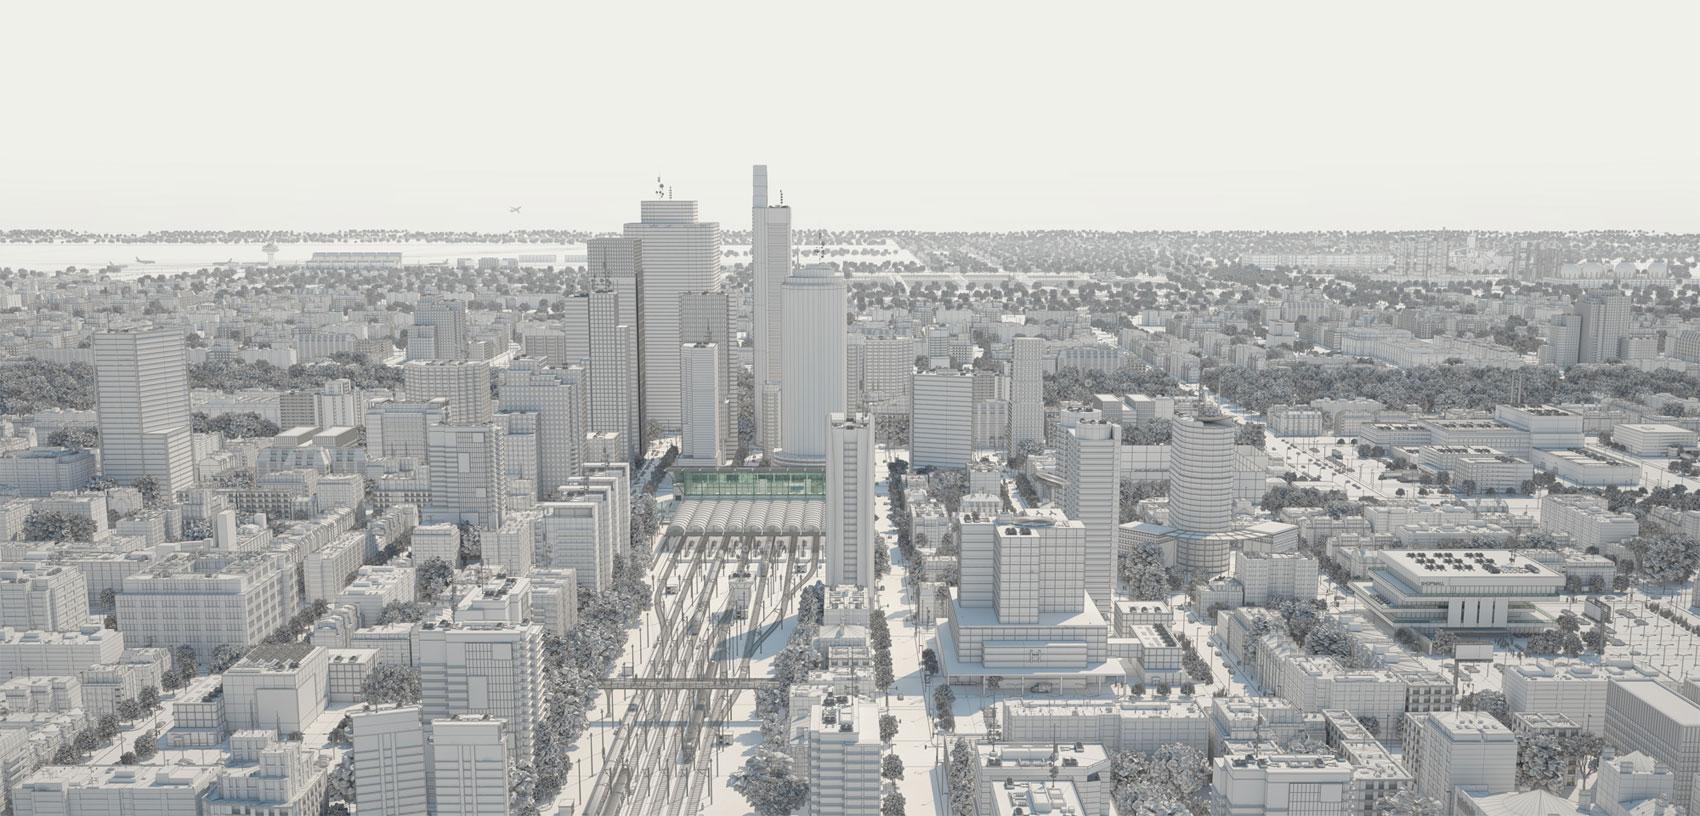 ville-socomec-multi-segments-1